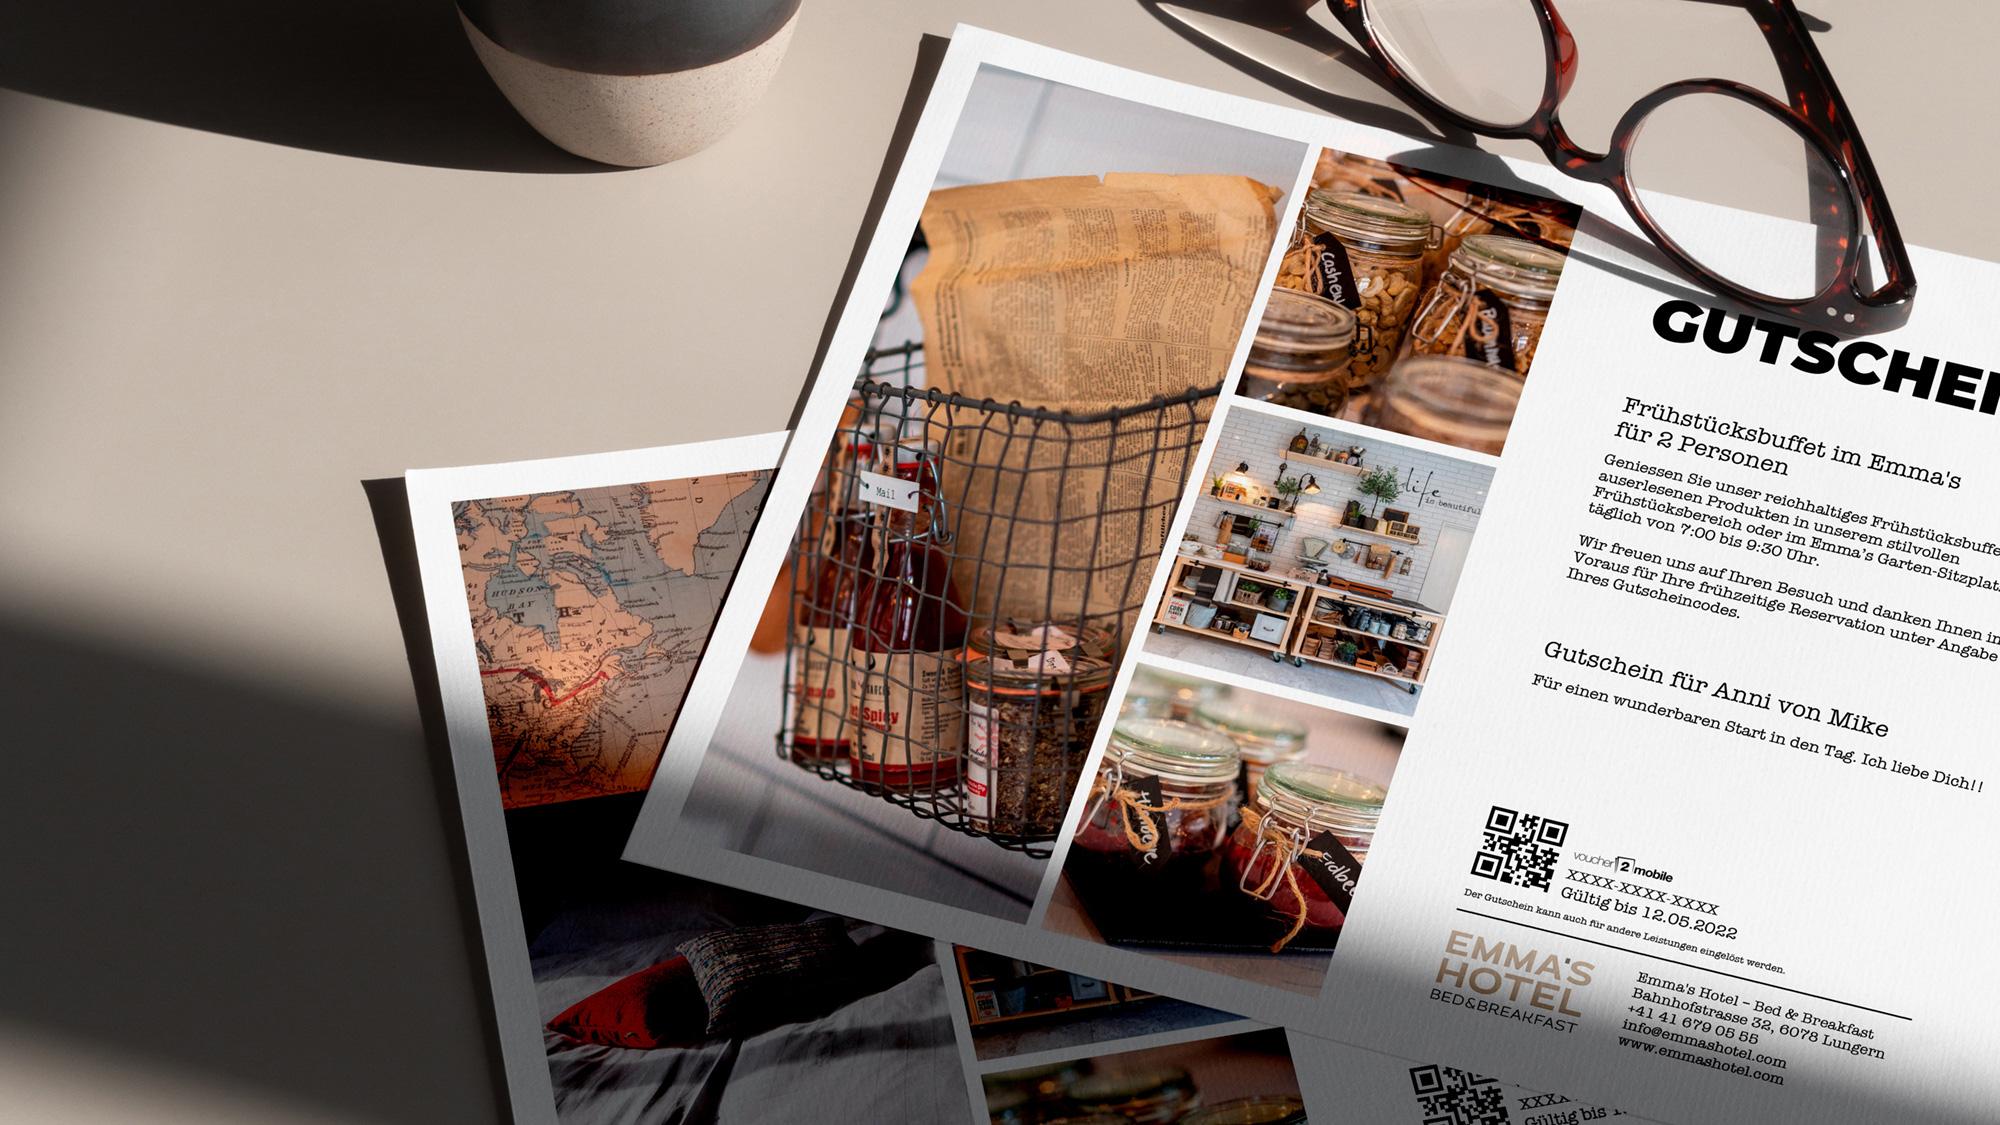 e-guma Gutscheinsystem Gutscheinlayout print@home EMMAS HOTEL